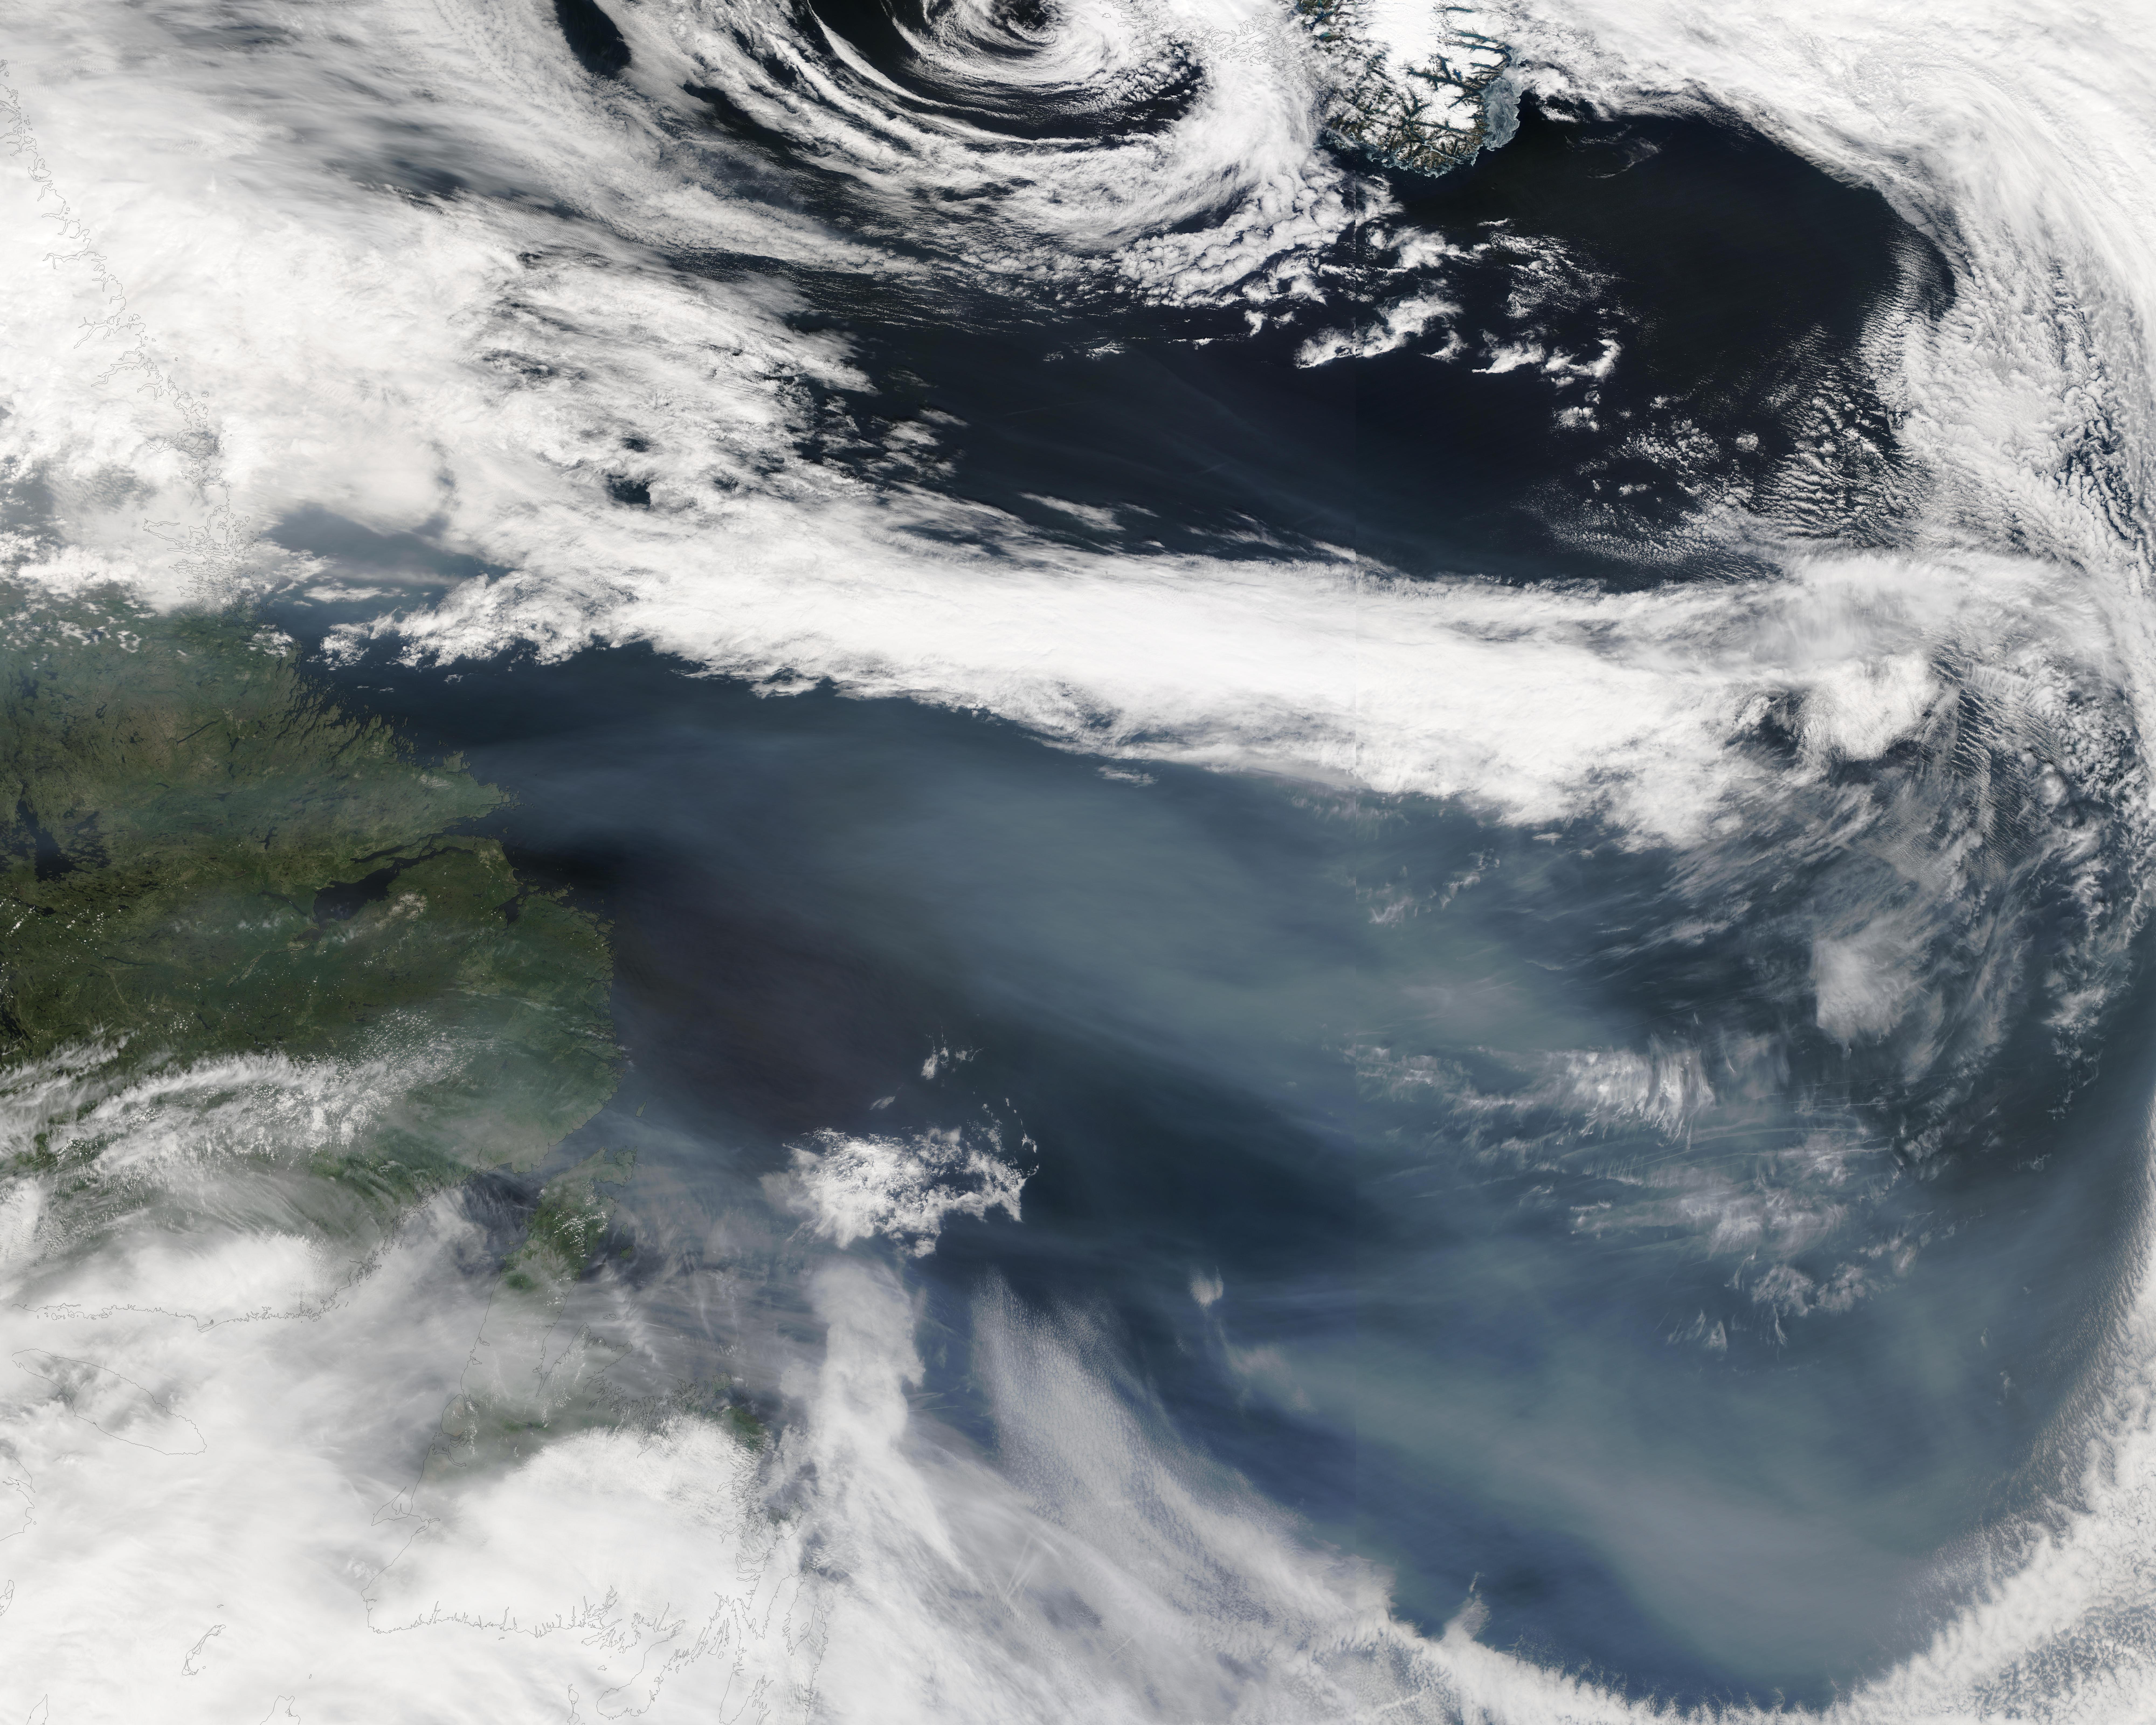 Humo de incendio forestal de Alaska cerca de Canadá